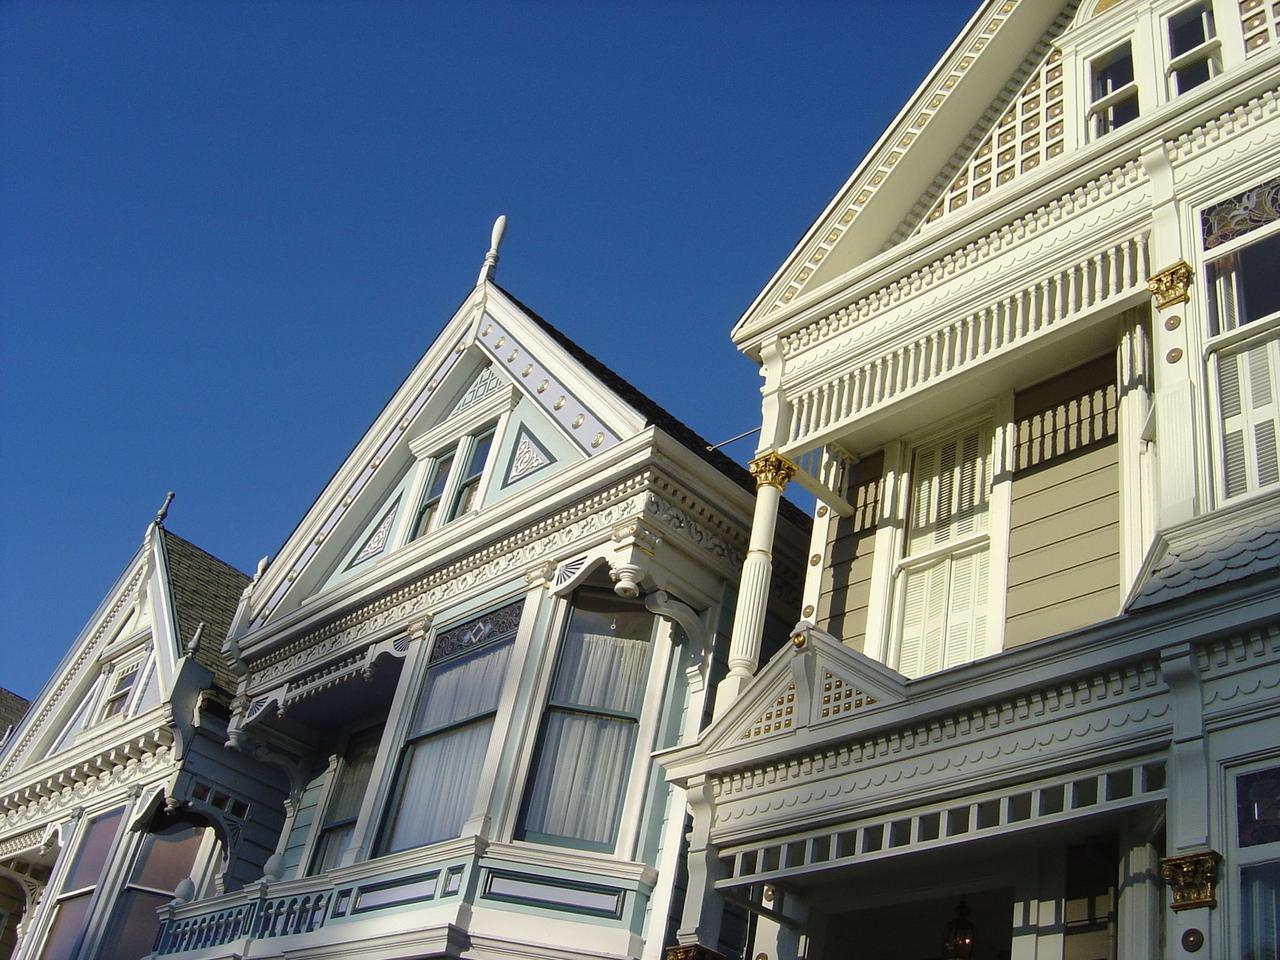 victorian-houses-of-san-franci-1542979-1280x960.jpg